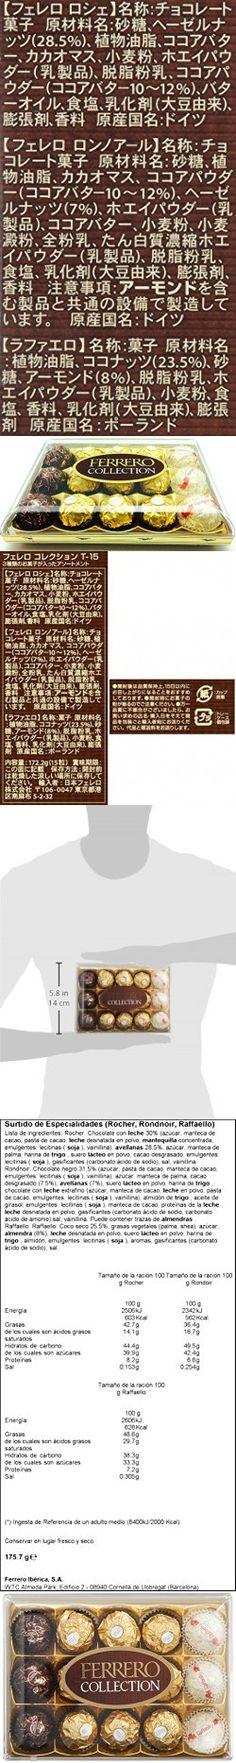 Ferrero Rocher - Ferrero Collection: Rocher, Raffaello, Roundnoir - 172g